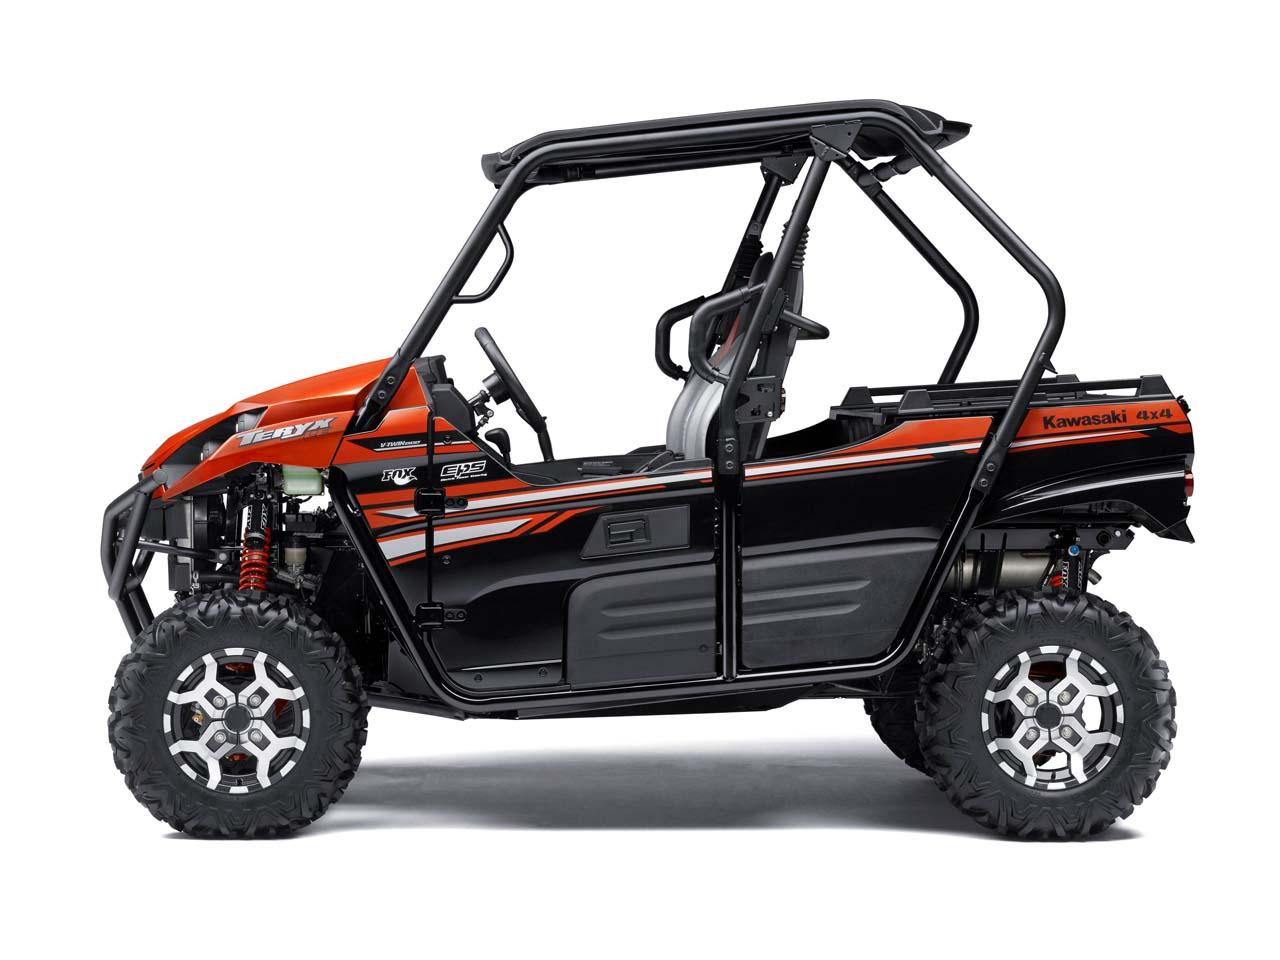 Kawasaki Teryx Le